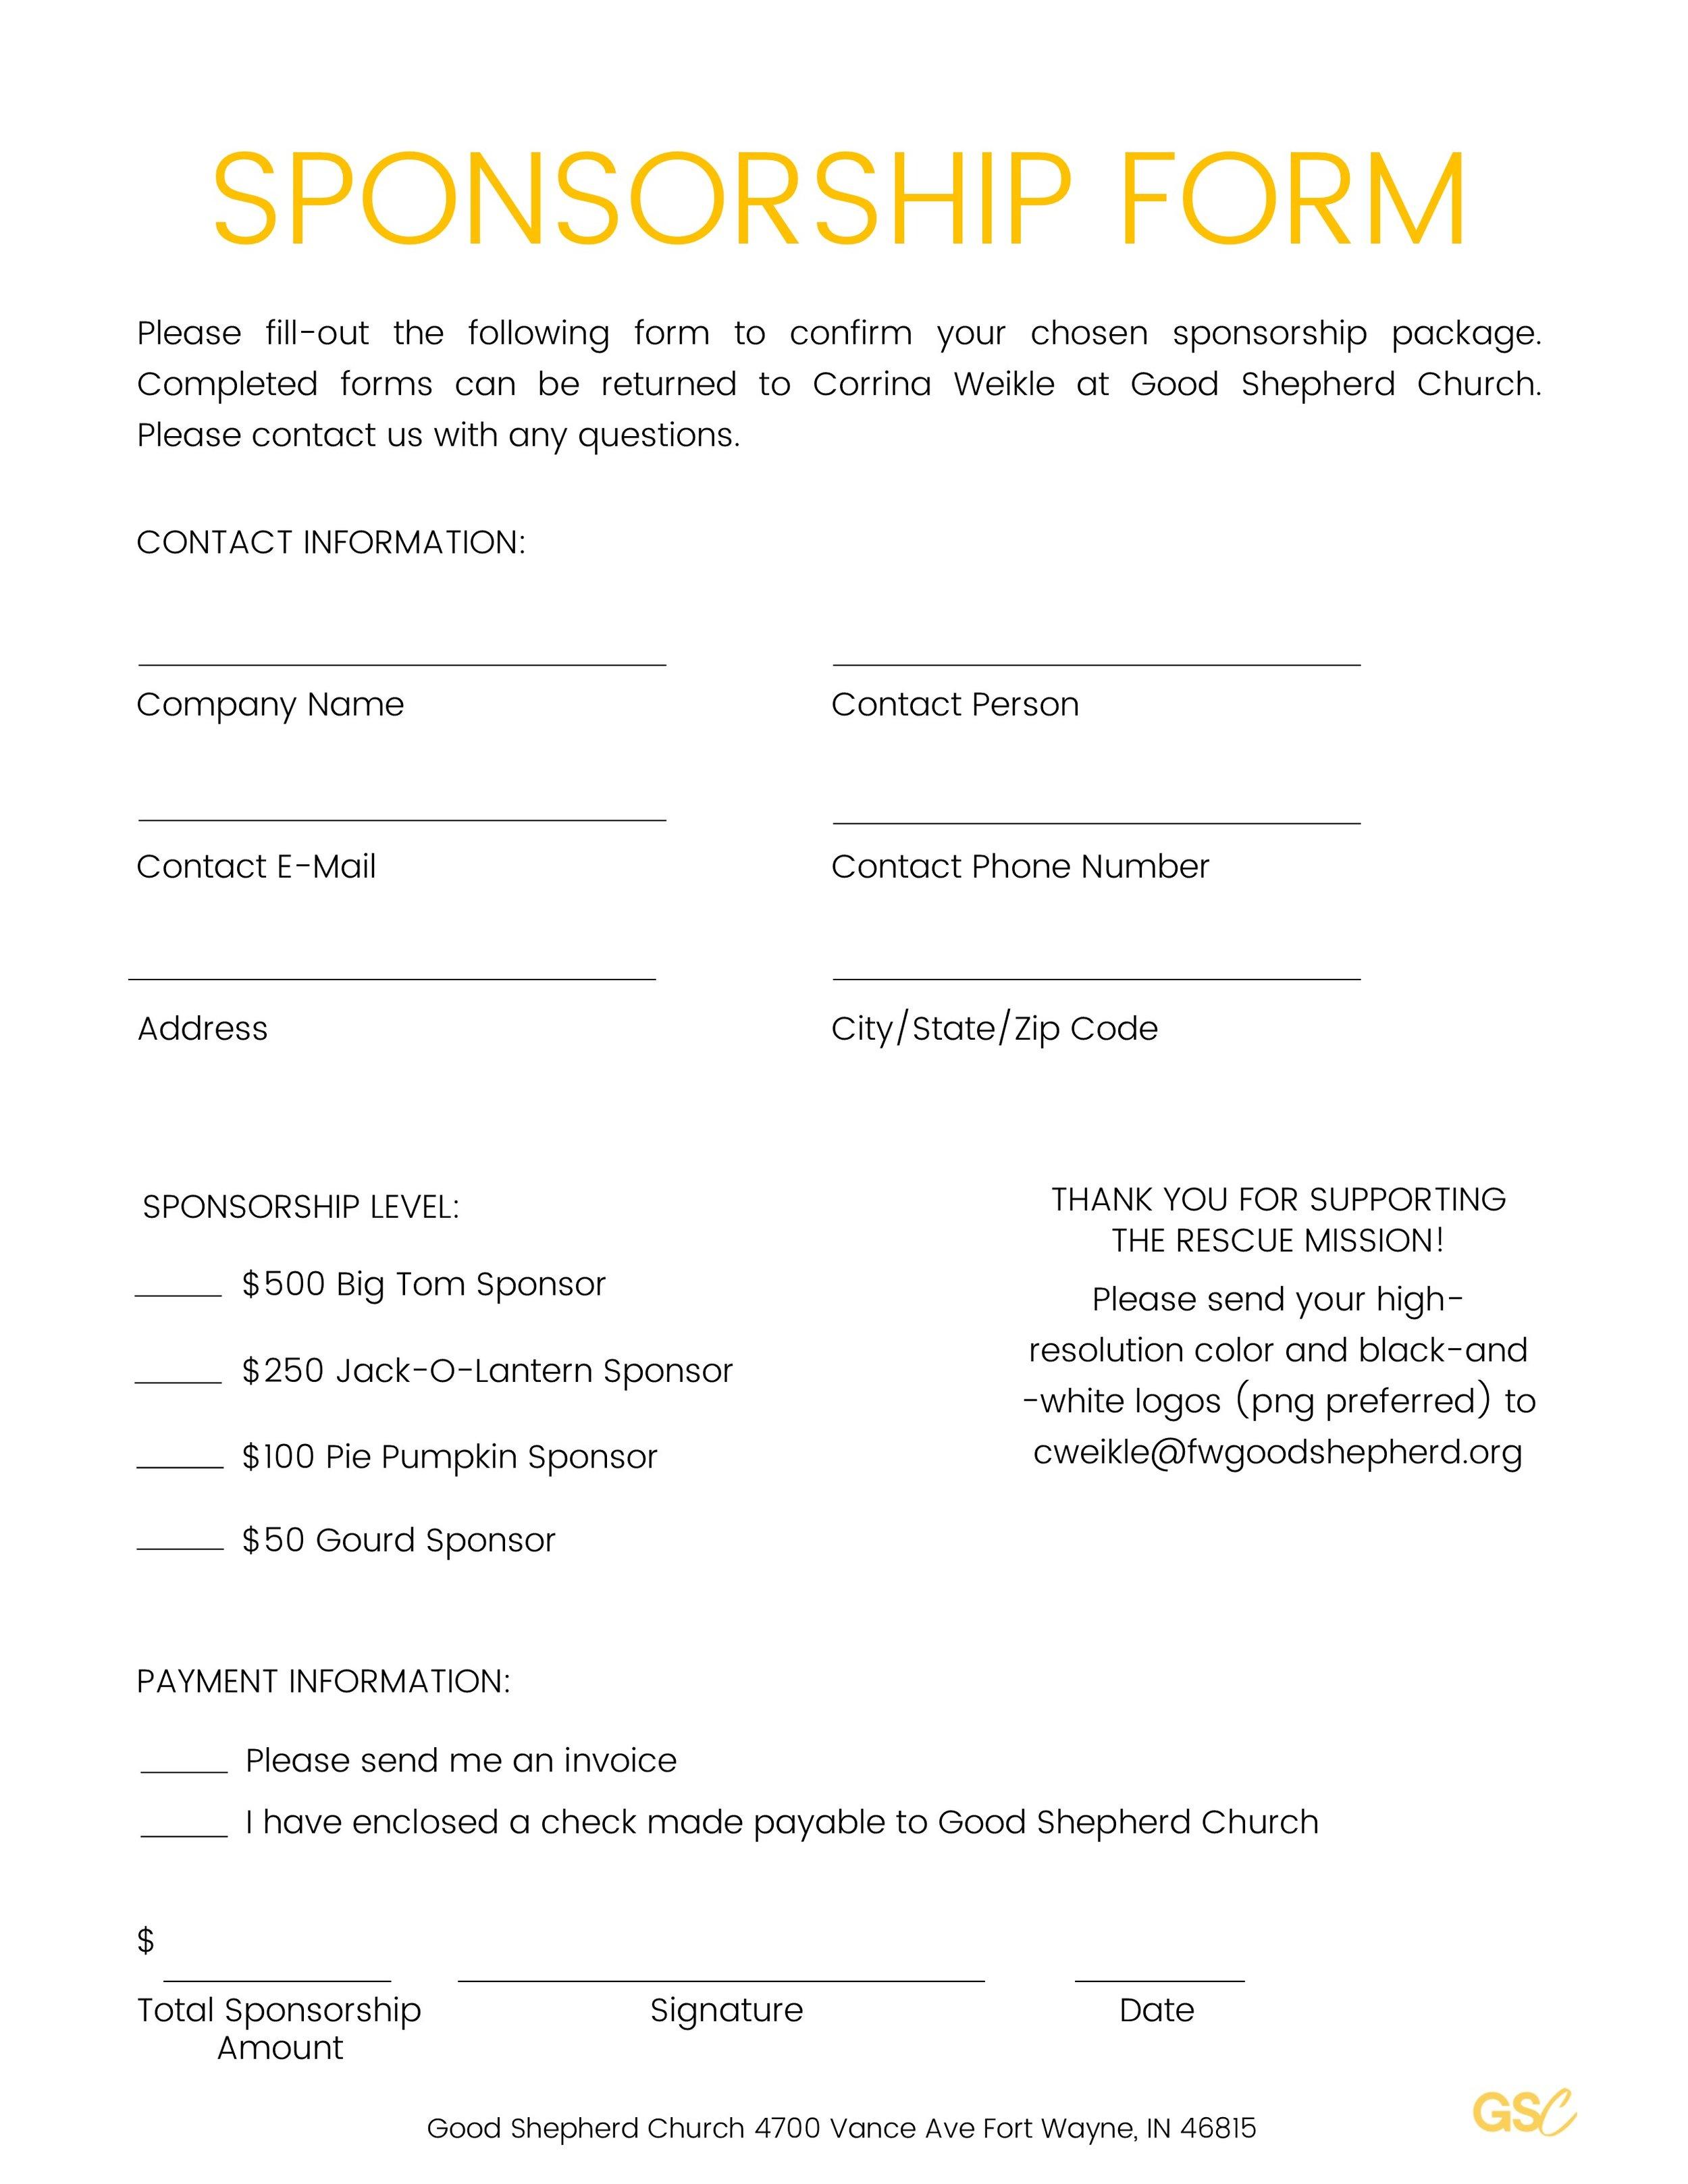 sponsorship forms 2ndpage.jpg